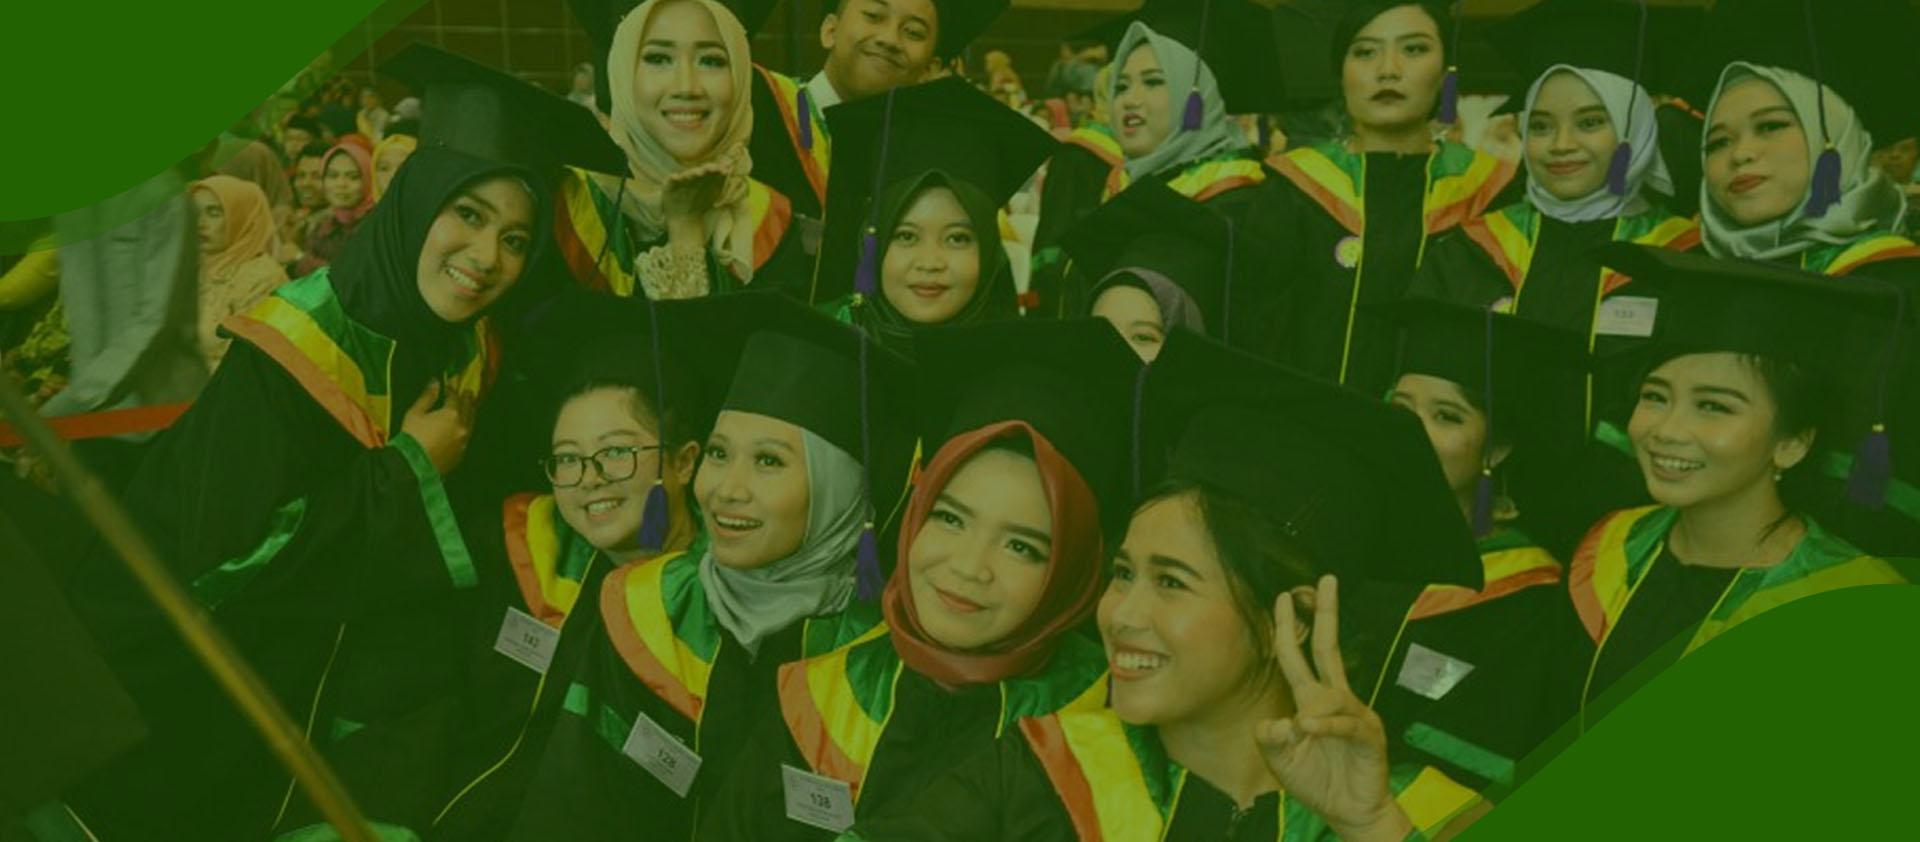 Pengumuman Kelulusan Jalur SBMPTN Universitas Negeri Jakarta